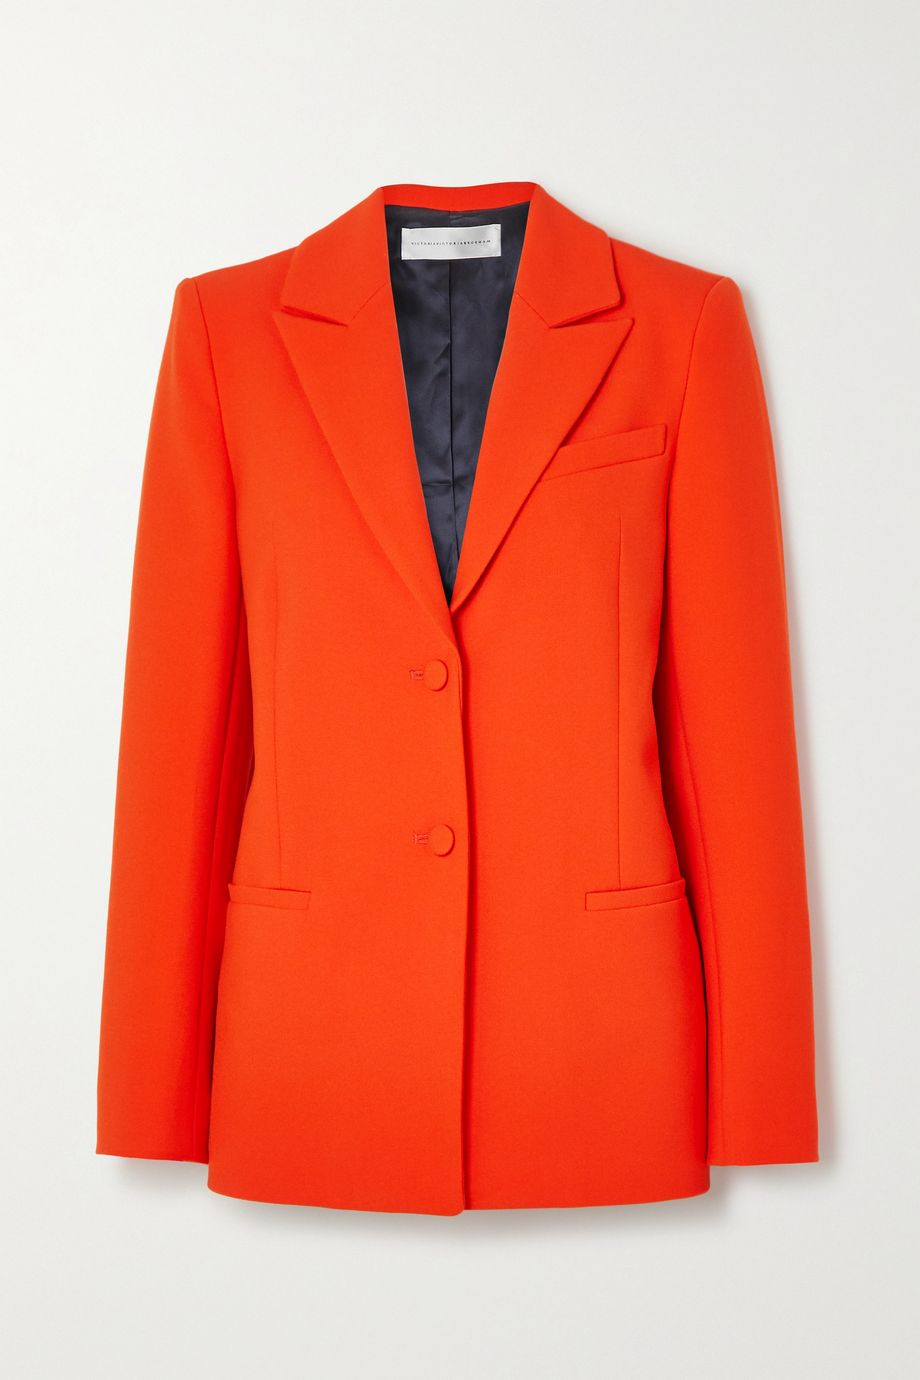 Victoria, Victoria Beckham Crepe blazer